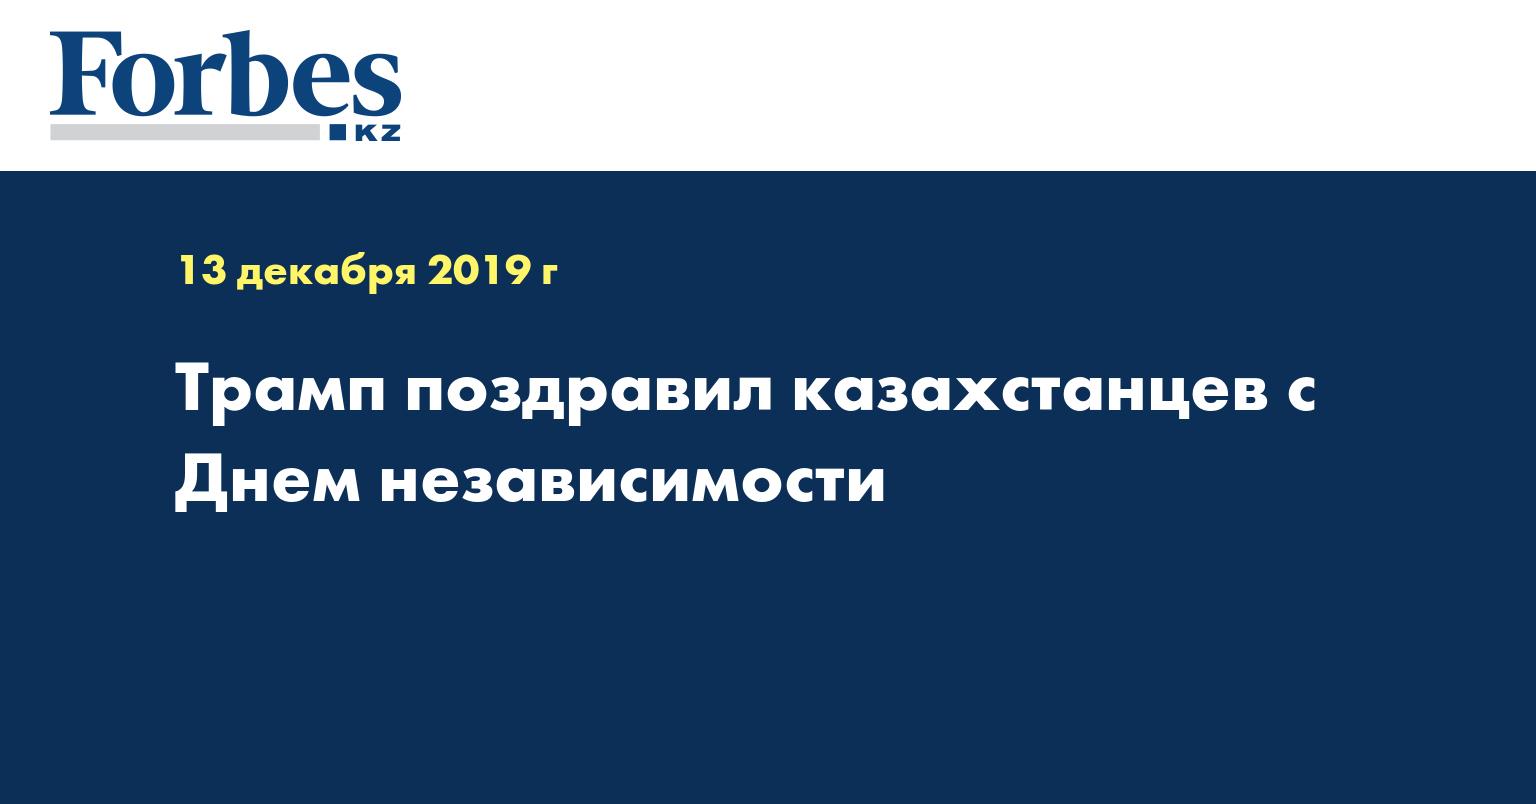 Трамп поздравил казахстанцев с Днем независимости